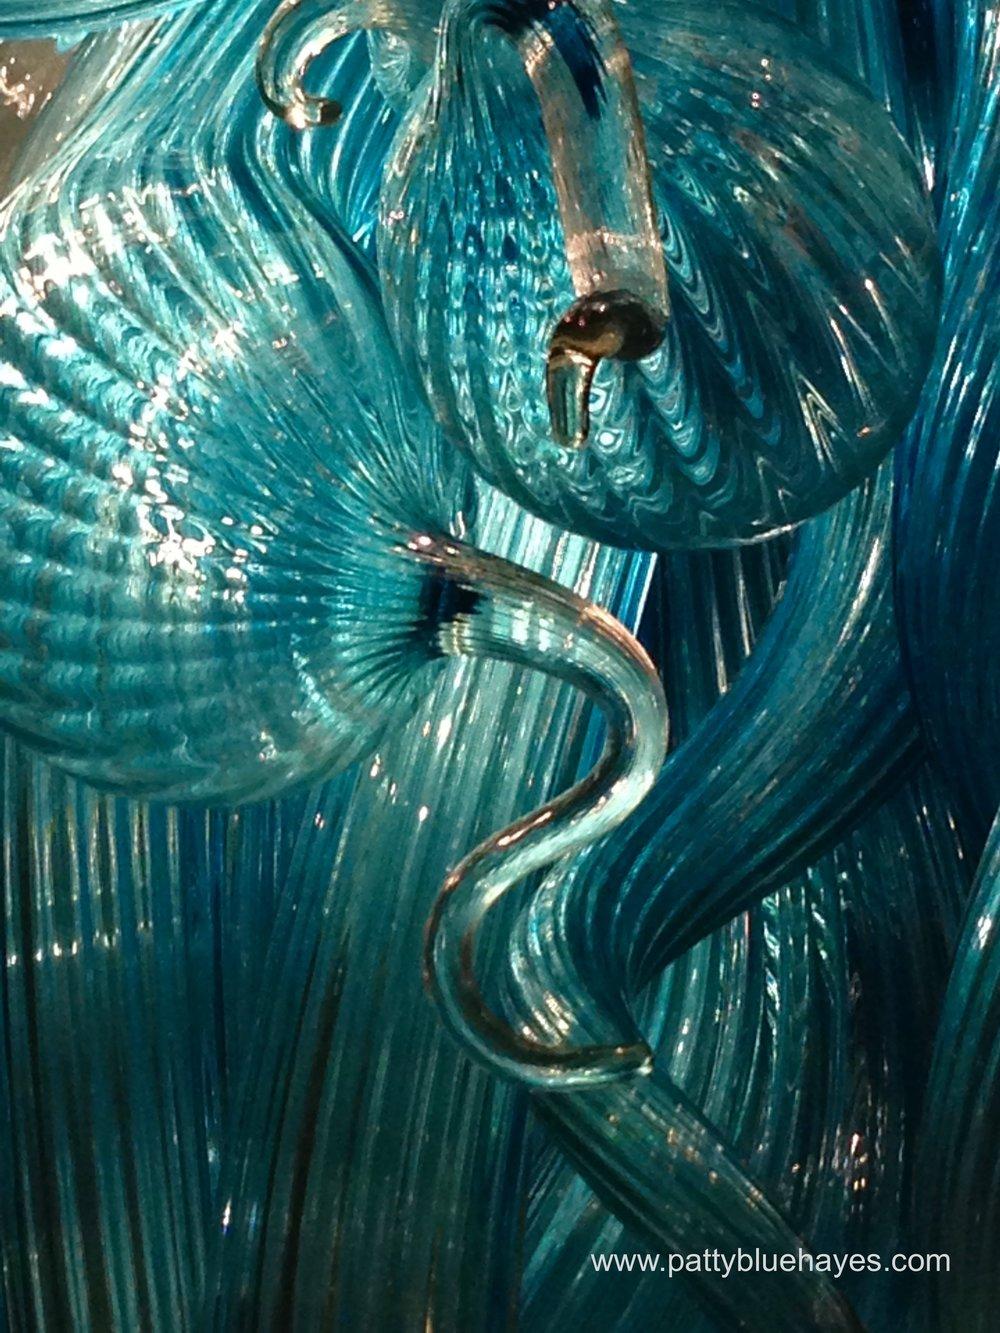 Chihuly Gardens and Glass - Seattle, WA